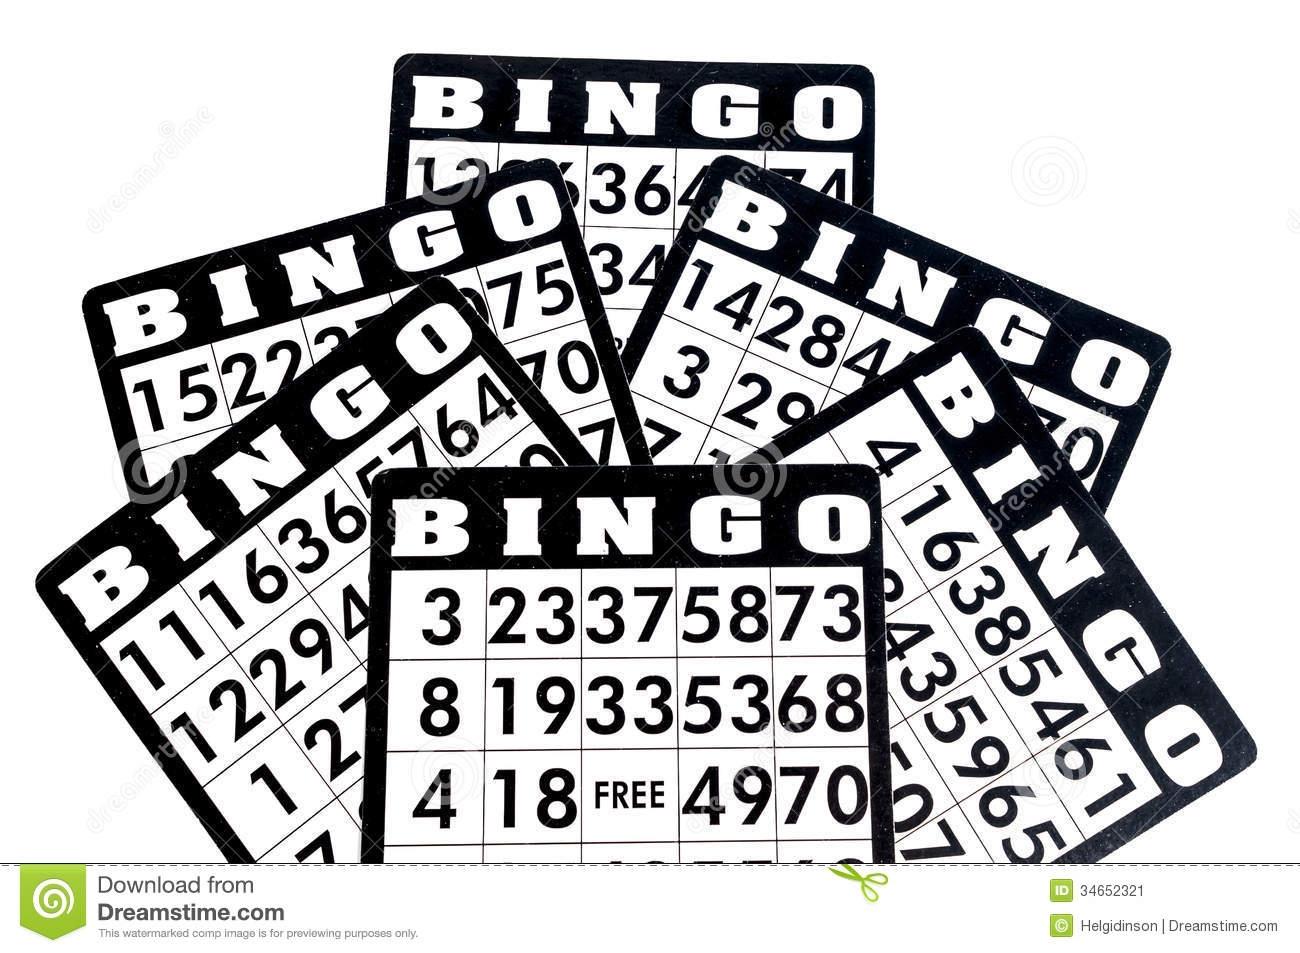 Bingo clipart bingo board.  collection of black